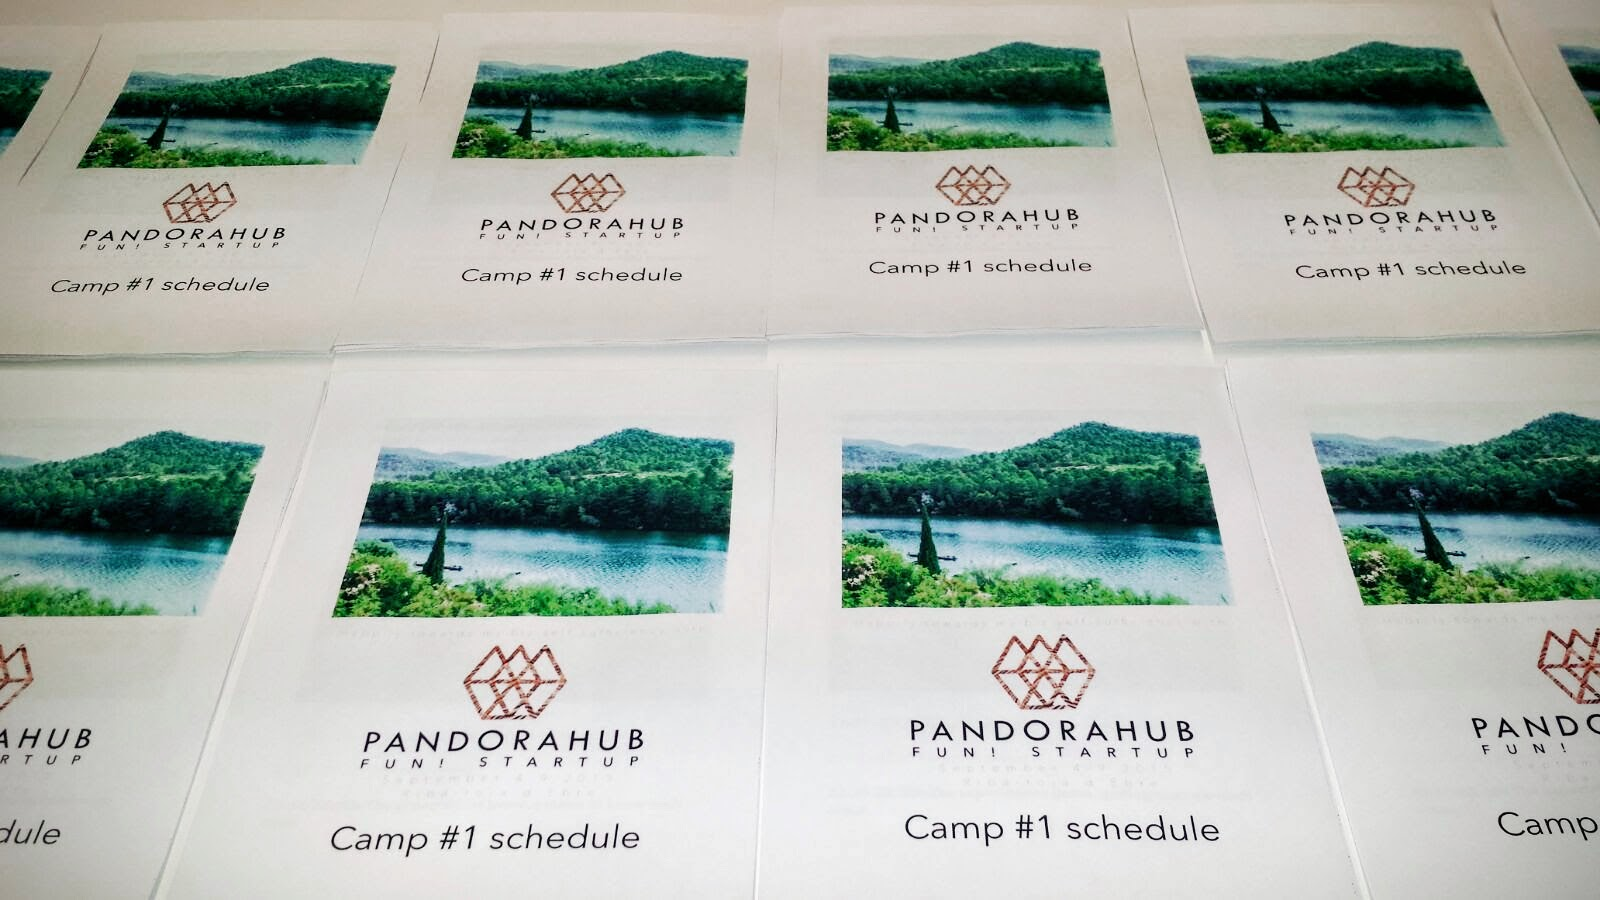 PANDORAHUB FUN! Startup #1